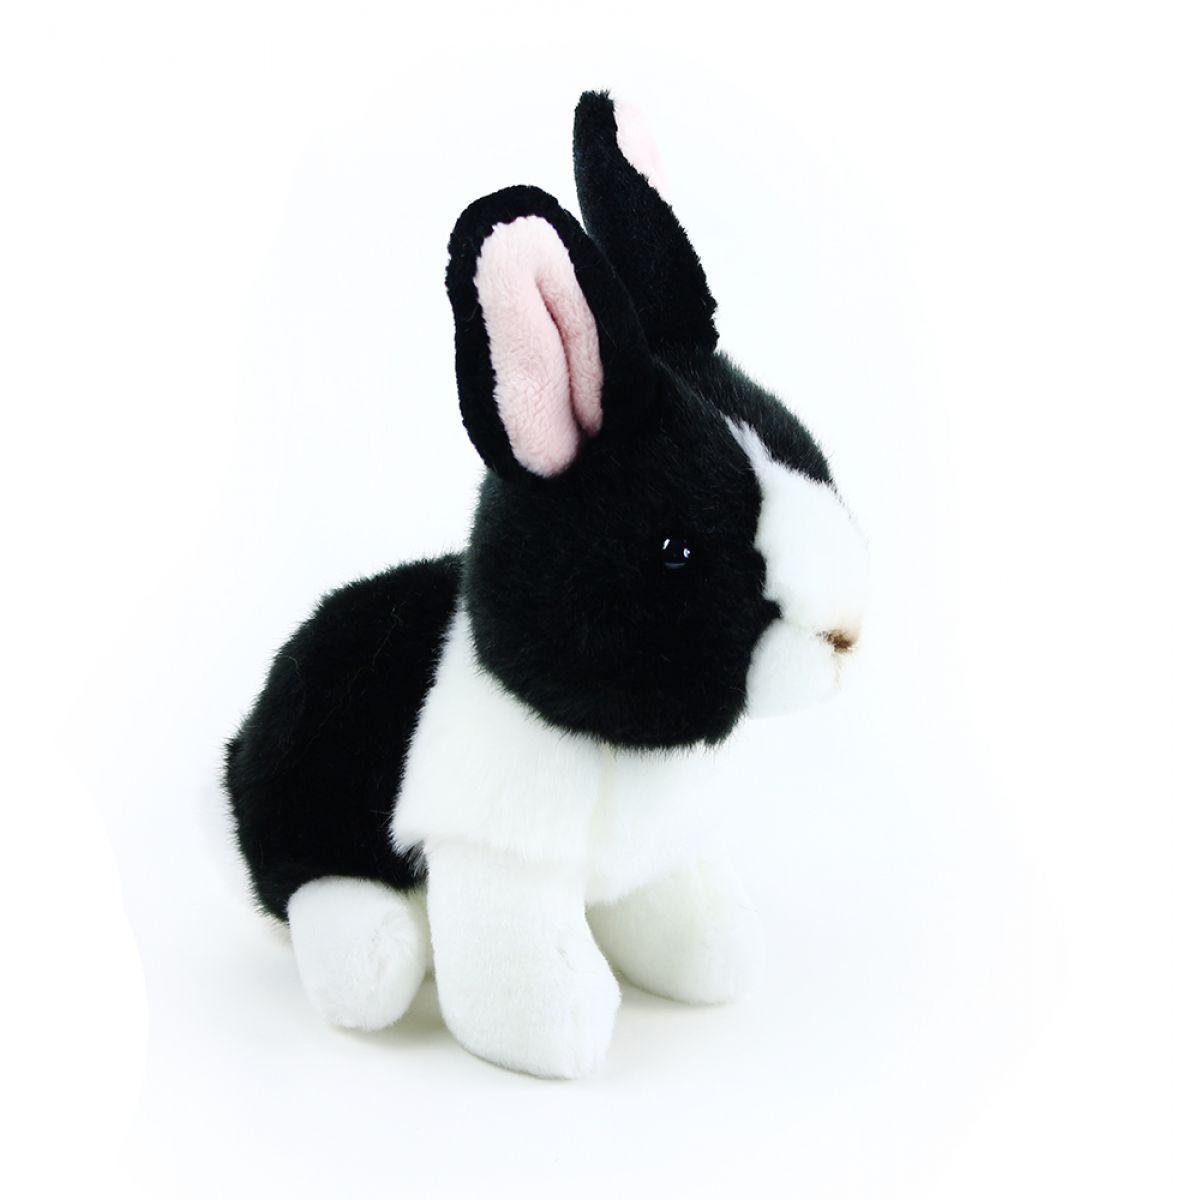 Rappa Plyšový králik 16 cm Čiernobiela